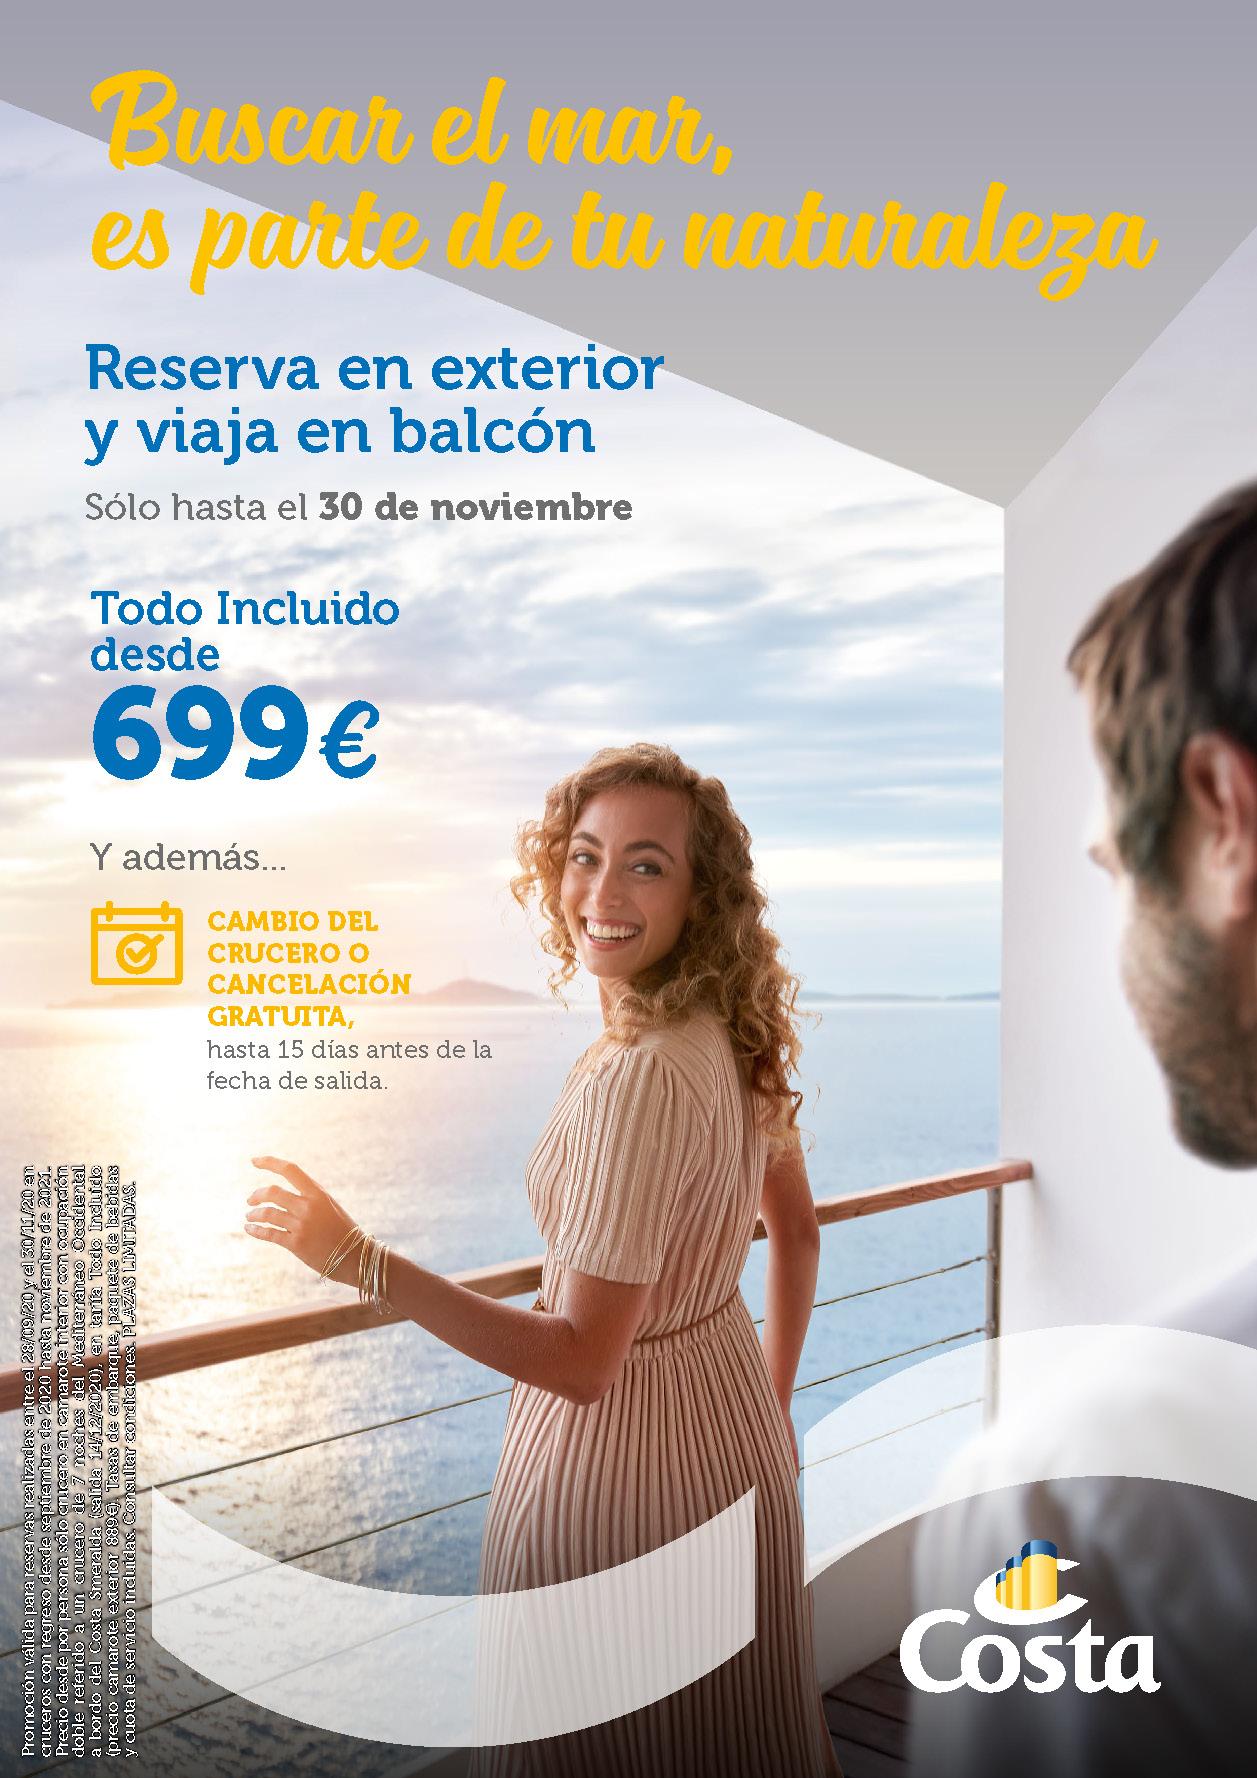 Oferta Costa Cruceros Octubre 2020 Balcon a precio de Exterior